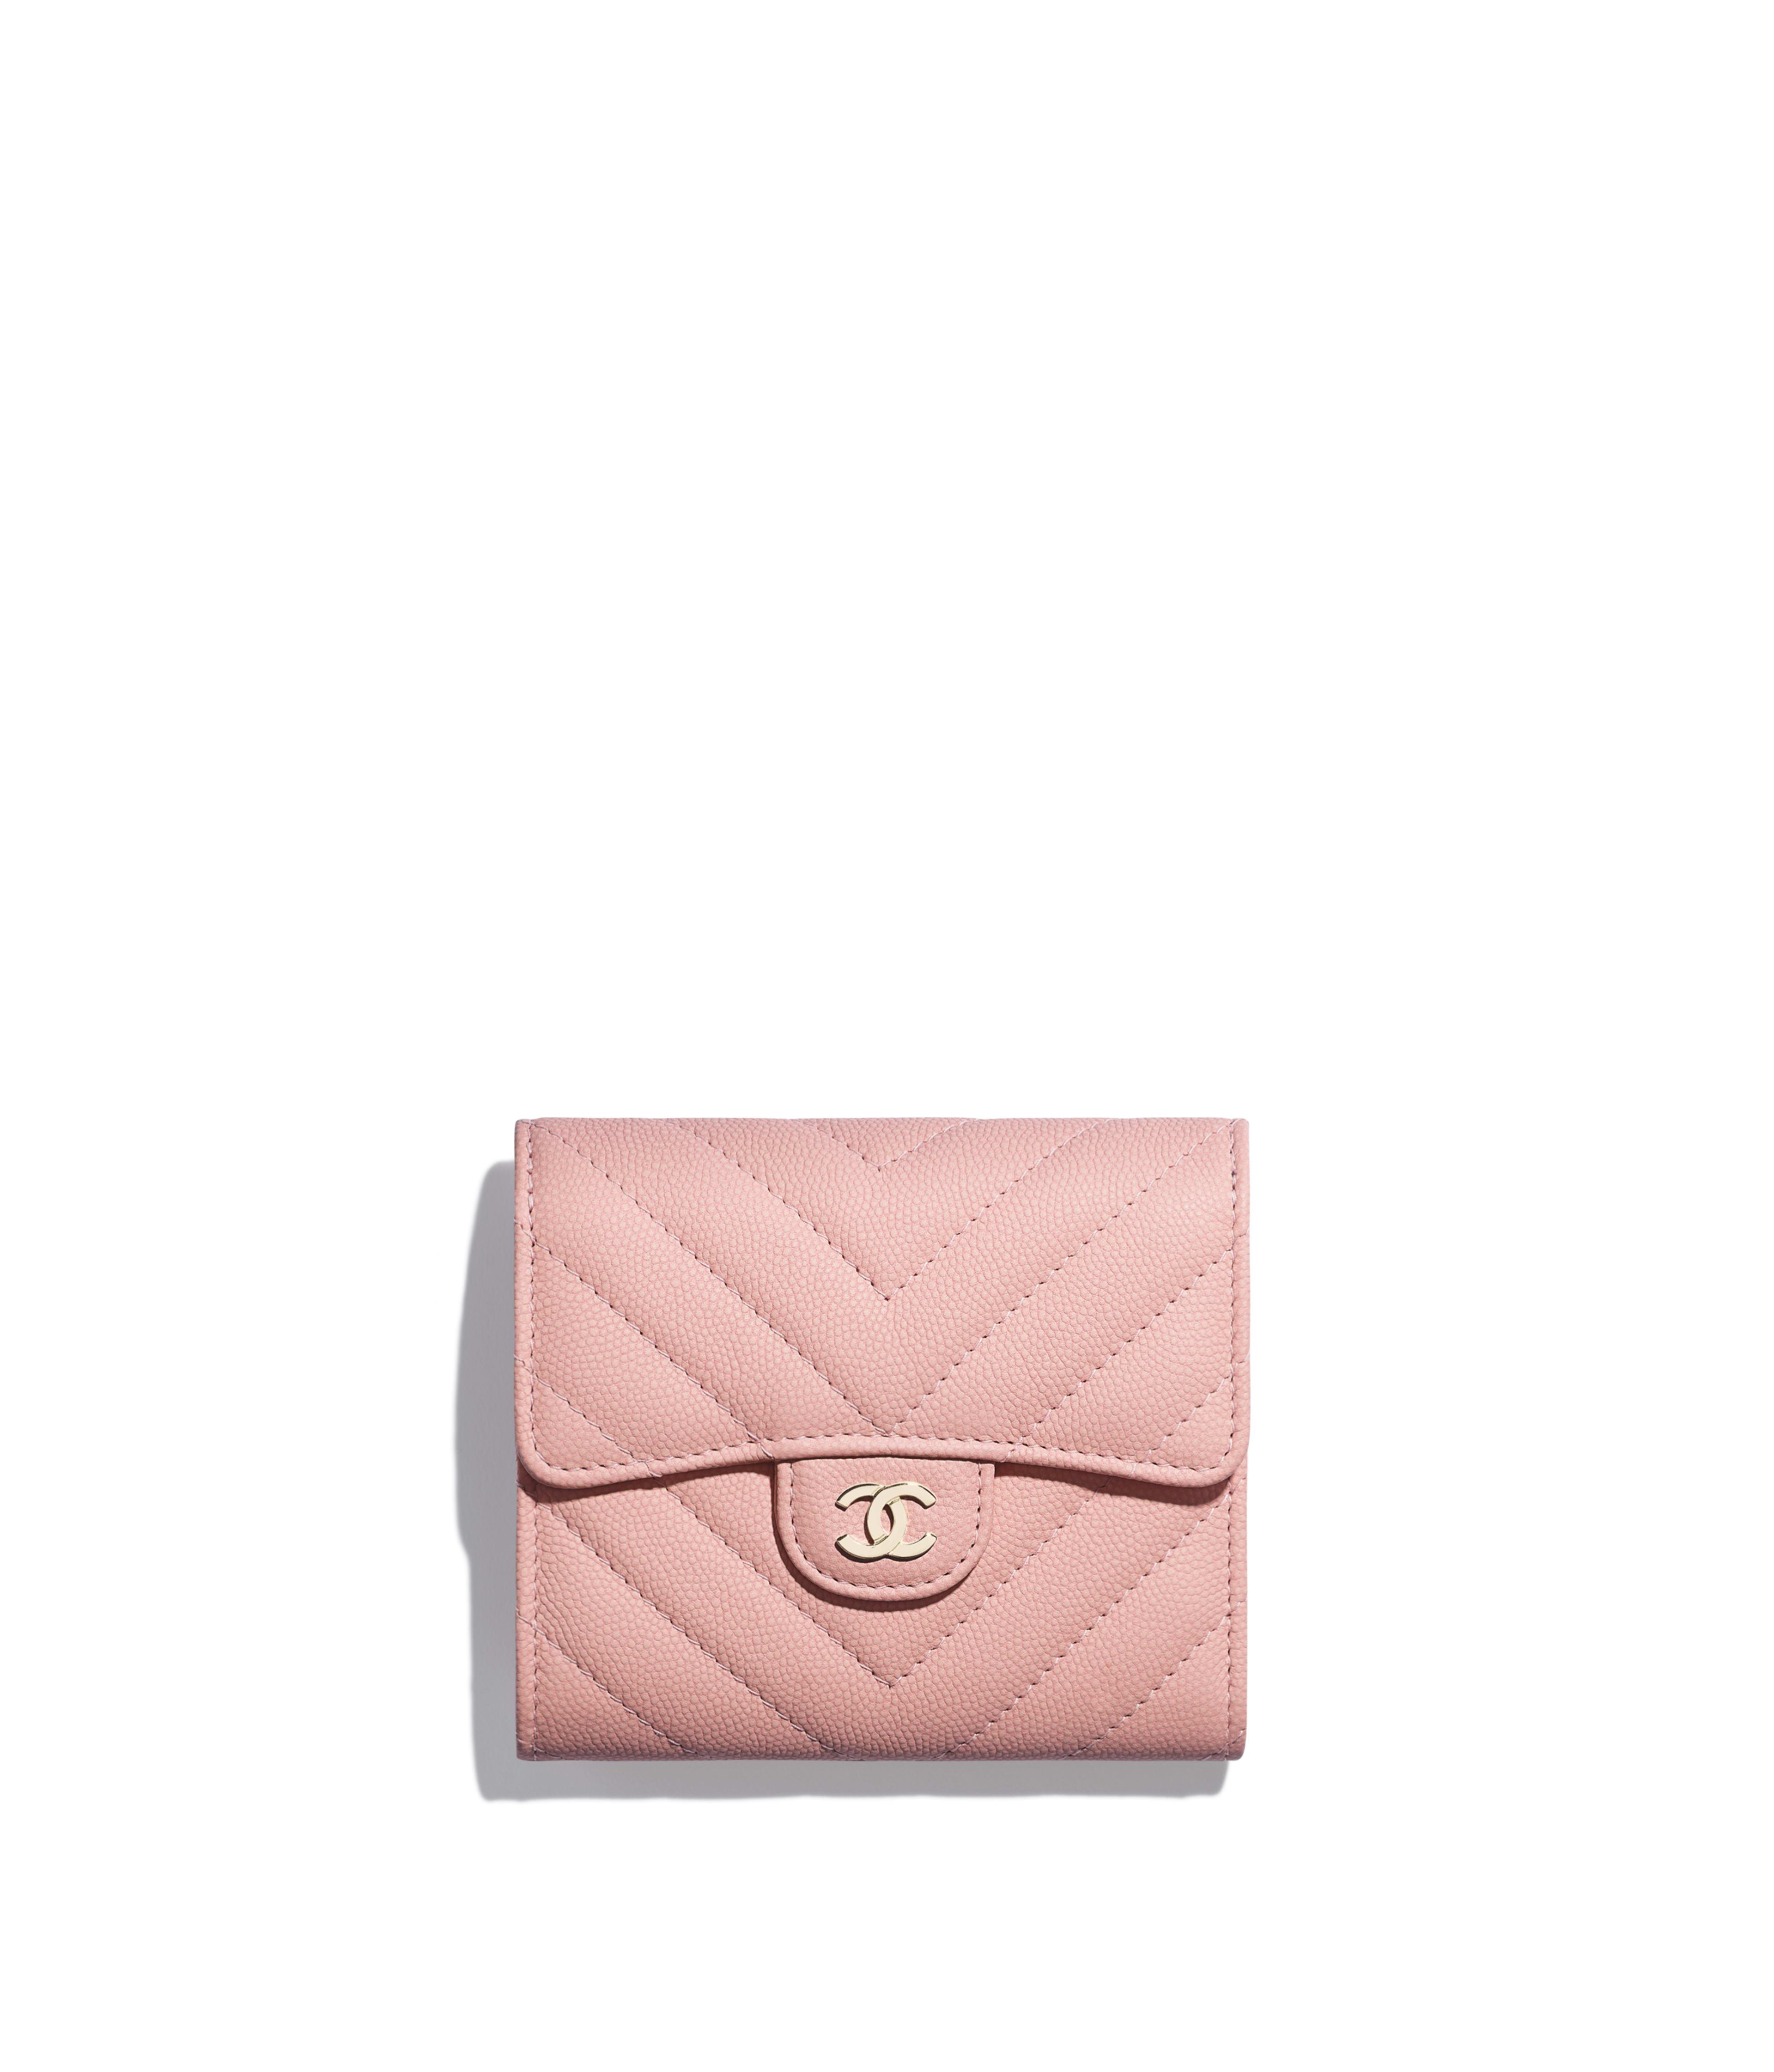 257d6fad73c375 Classic Small Flap Wallet Grained Calfskin & Gold-Tone Metal, Pink Ref.  A82288B00313N0897